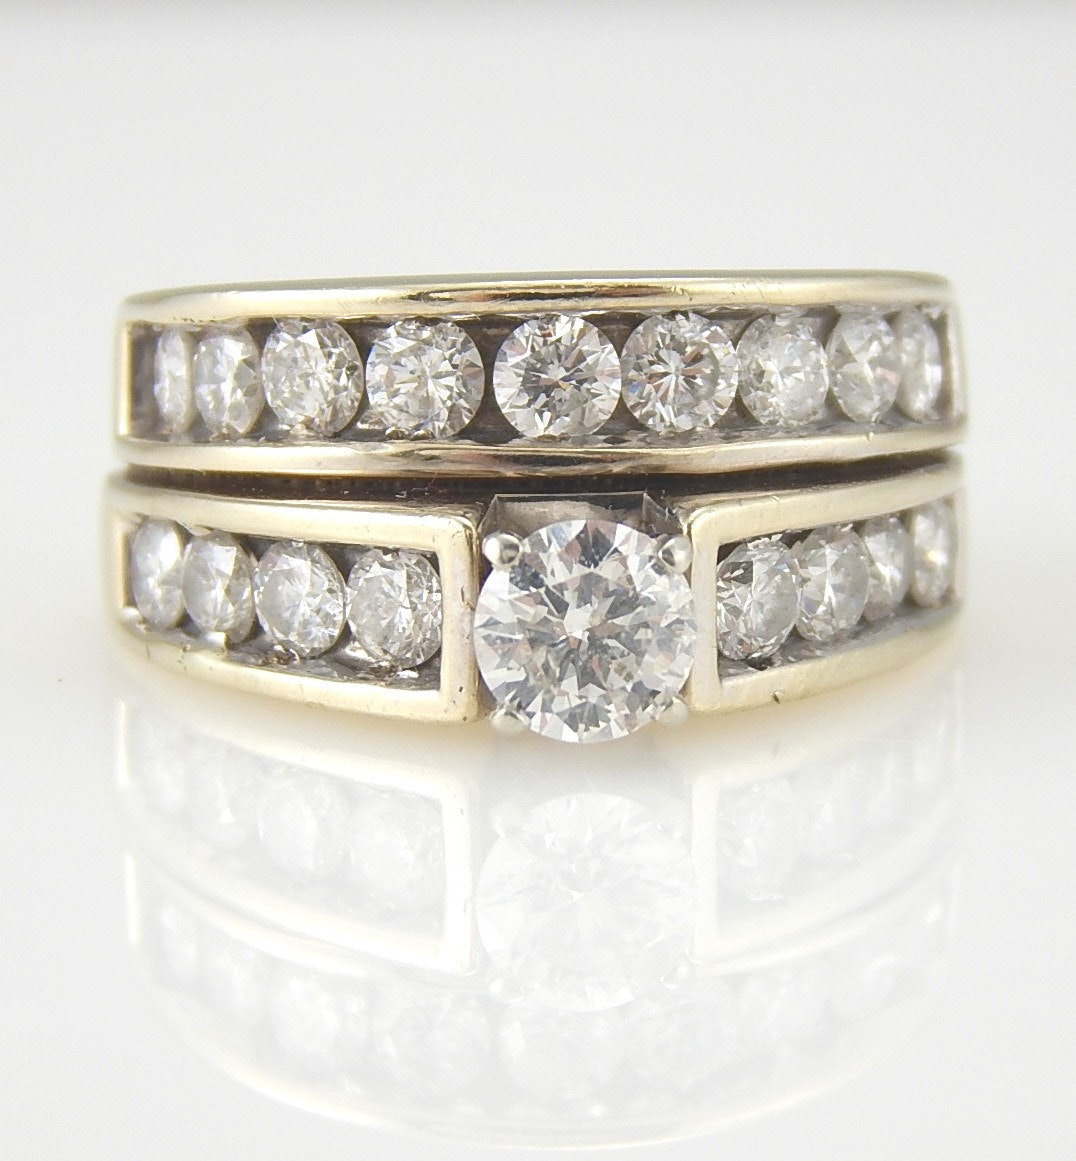 14K White Gold 2.24 CTW Diamond Ring Set